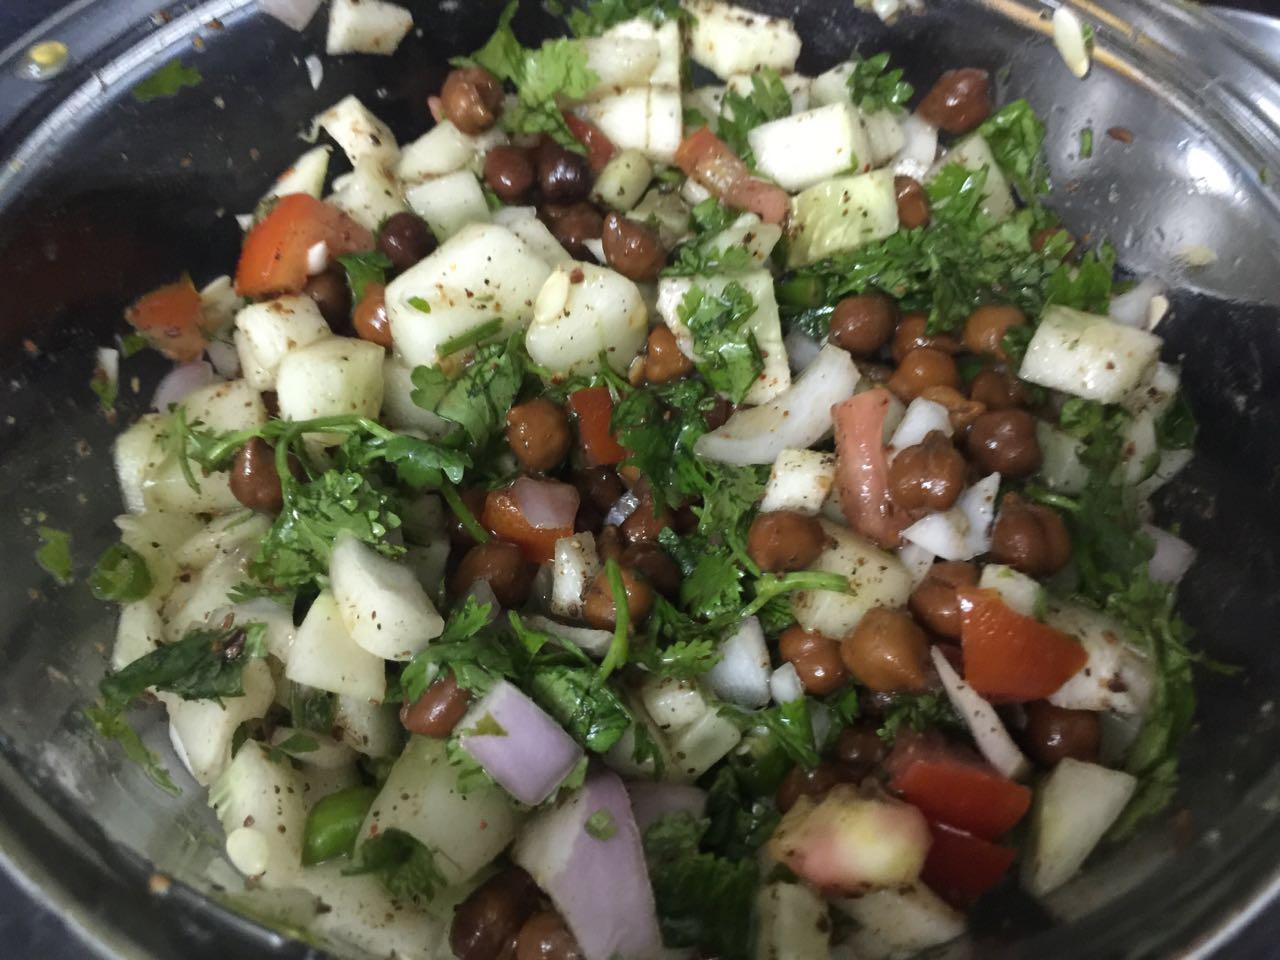 7 Day Simply Salad Recipes Indoindians Com